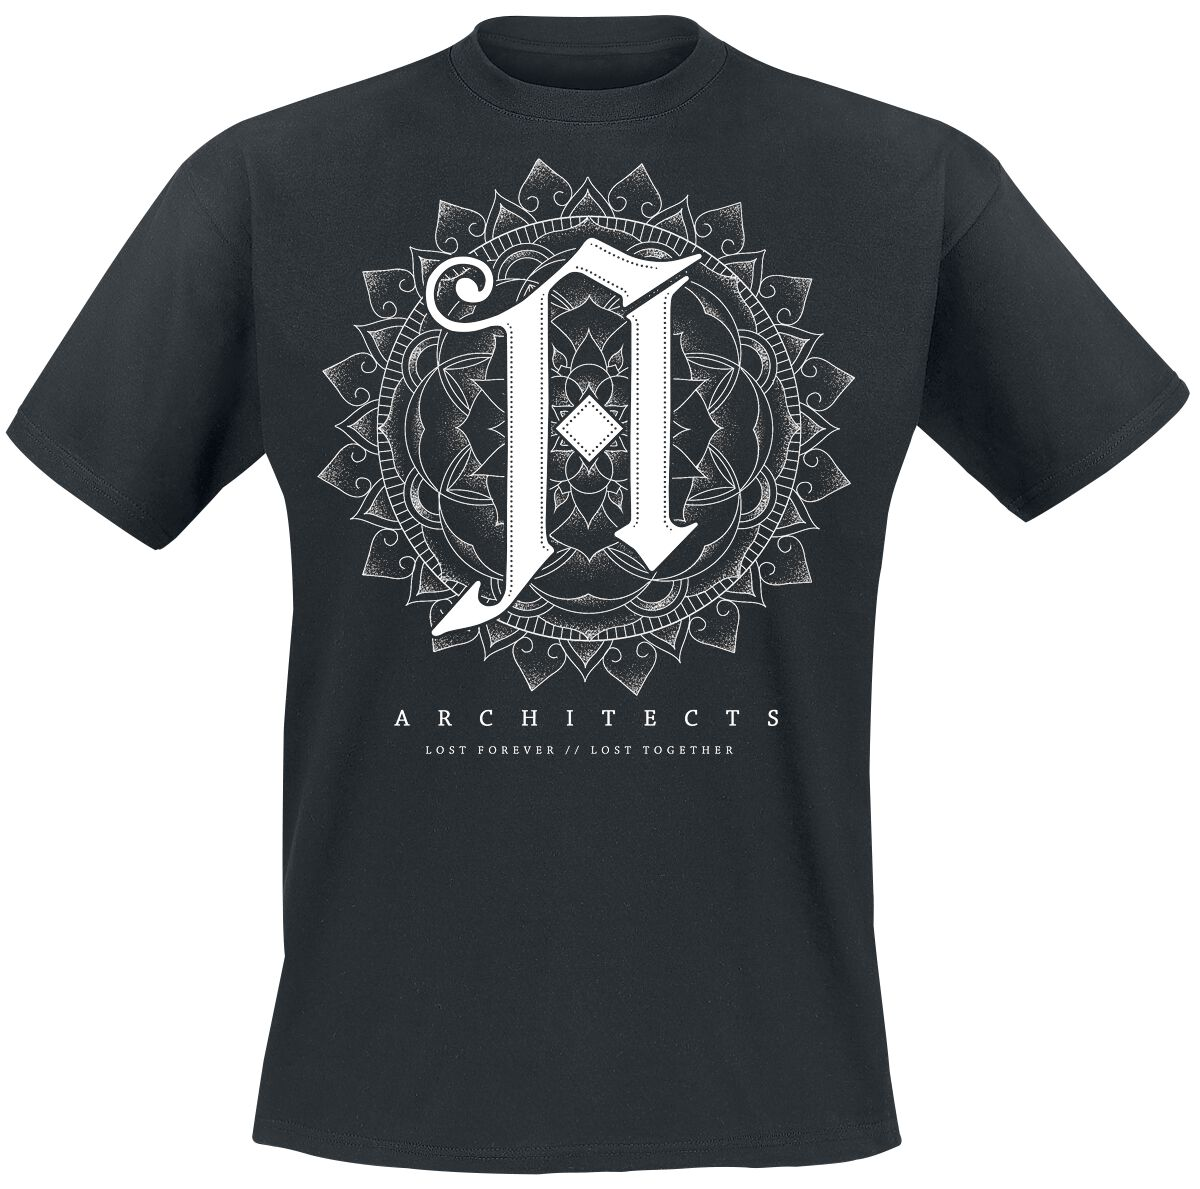 Architects Logo T-Shirt black